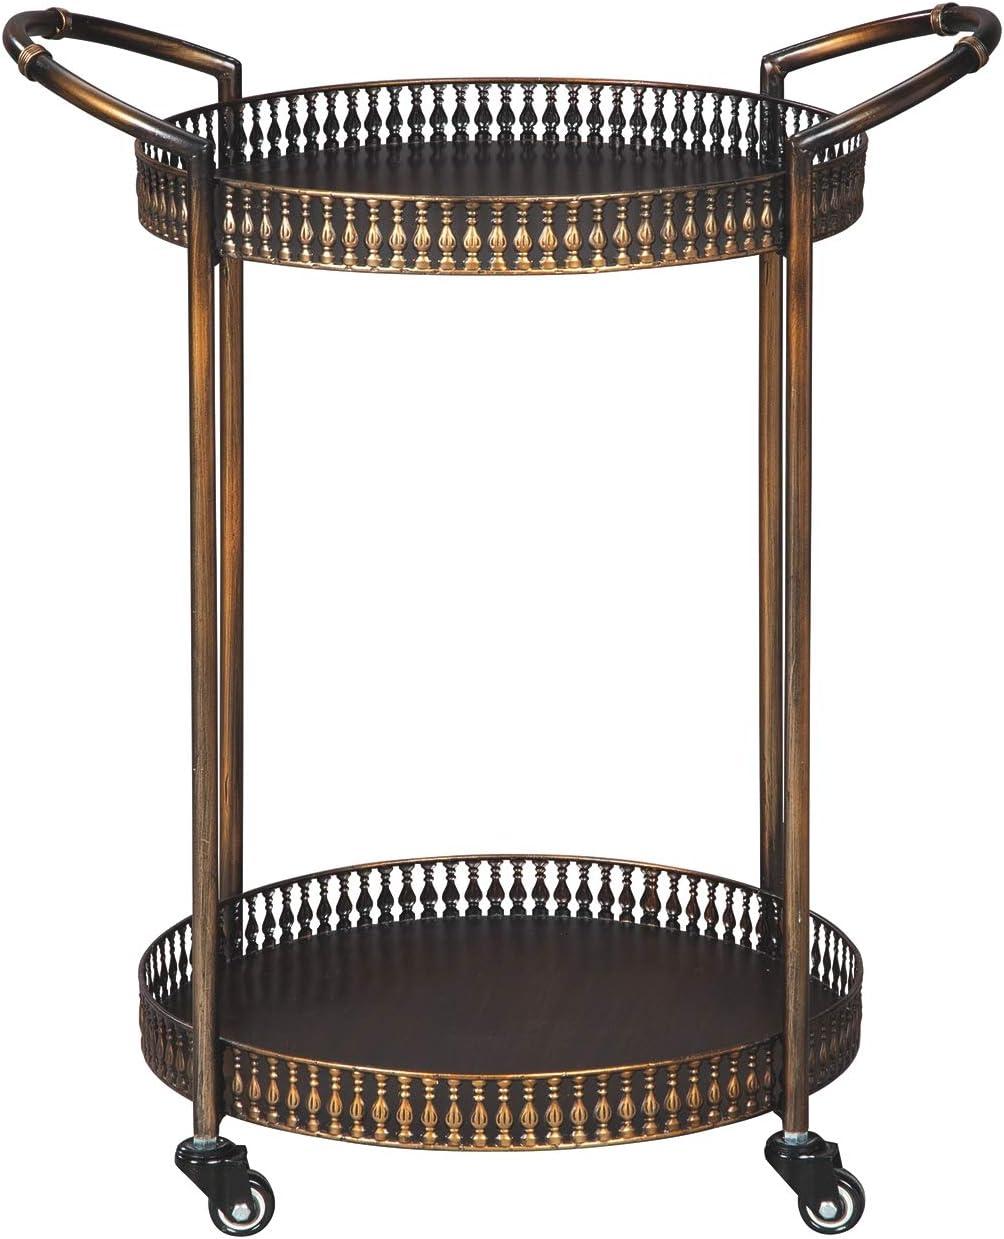 Clarkburn Bar Cart Bronze Finish Ashley Furniture Signature Design